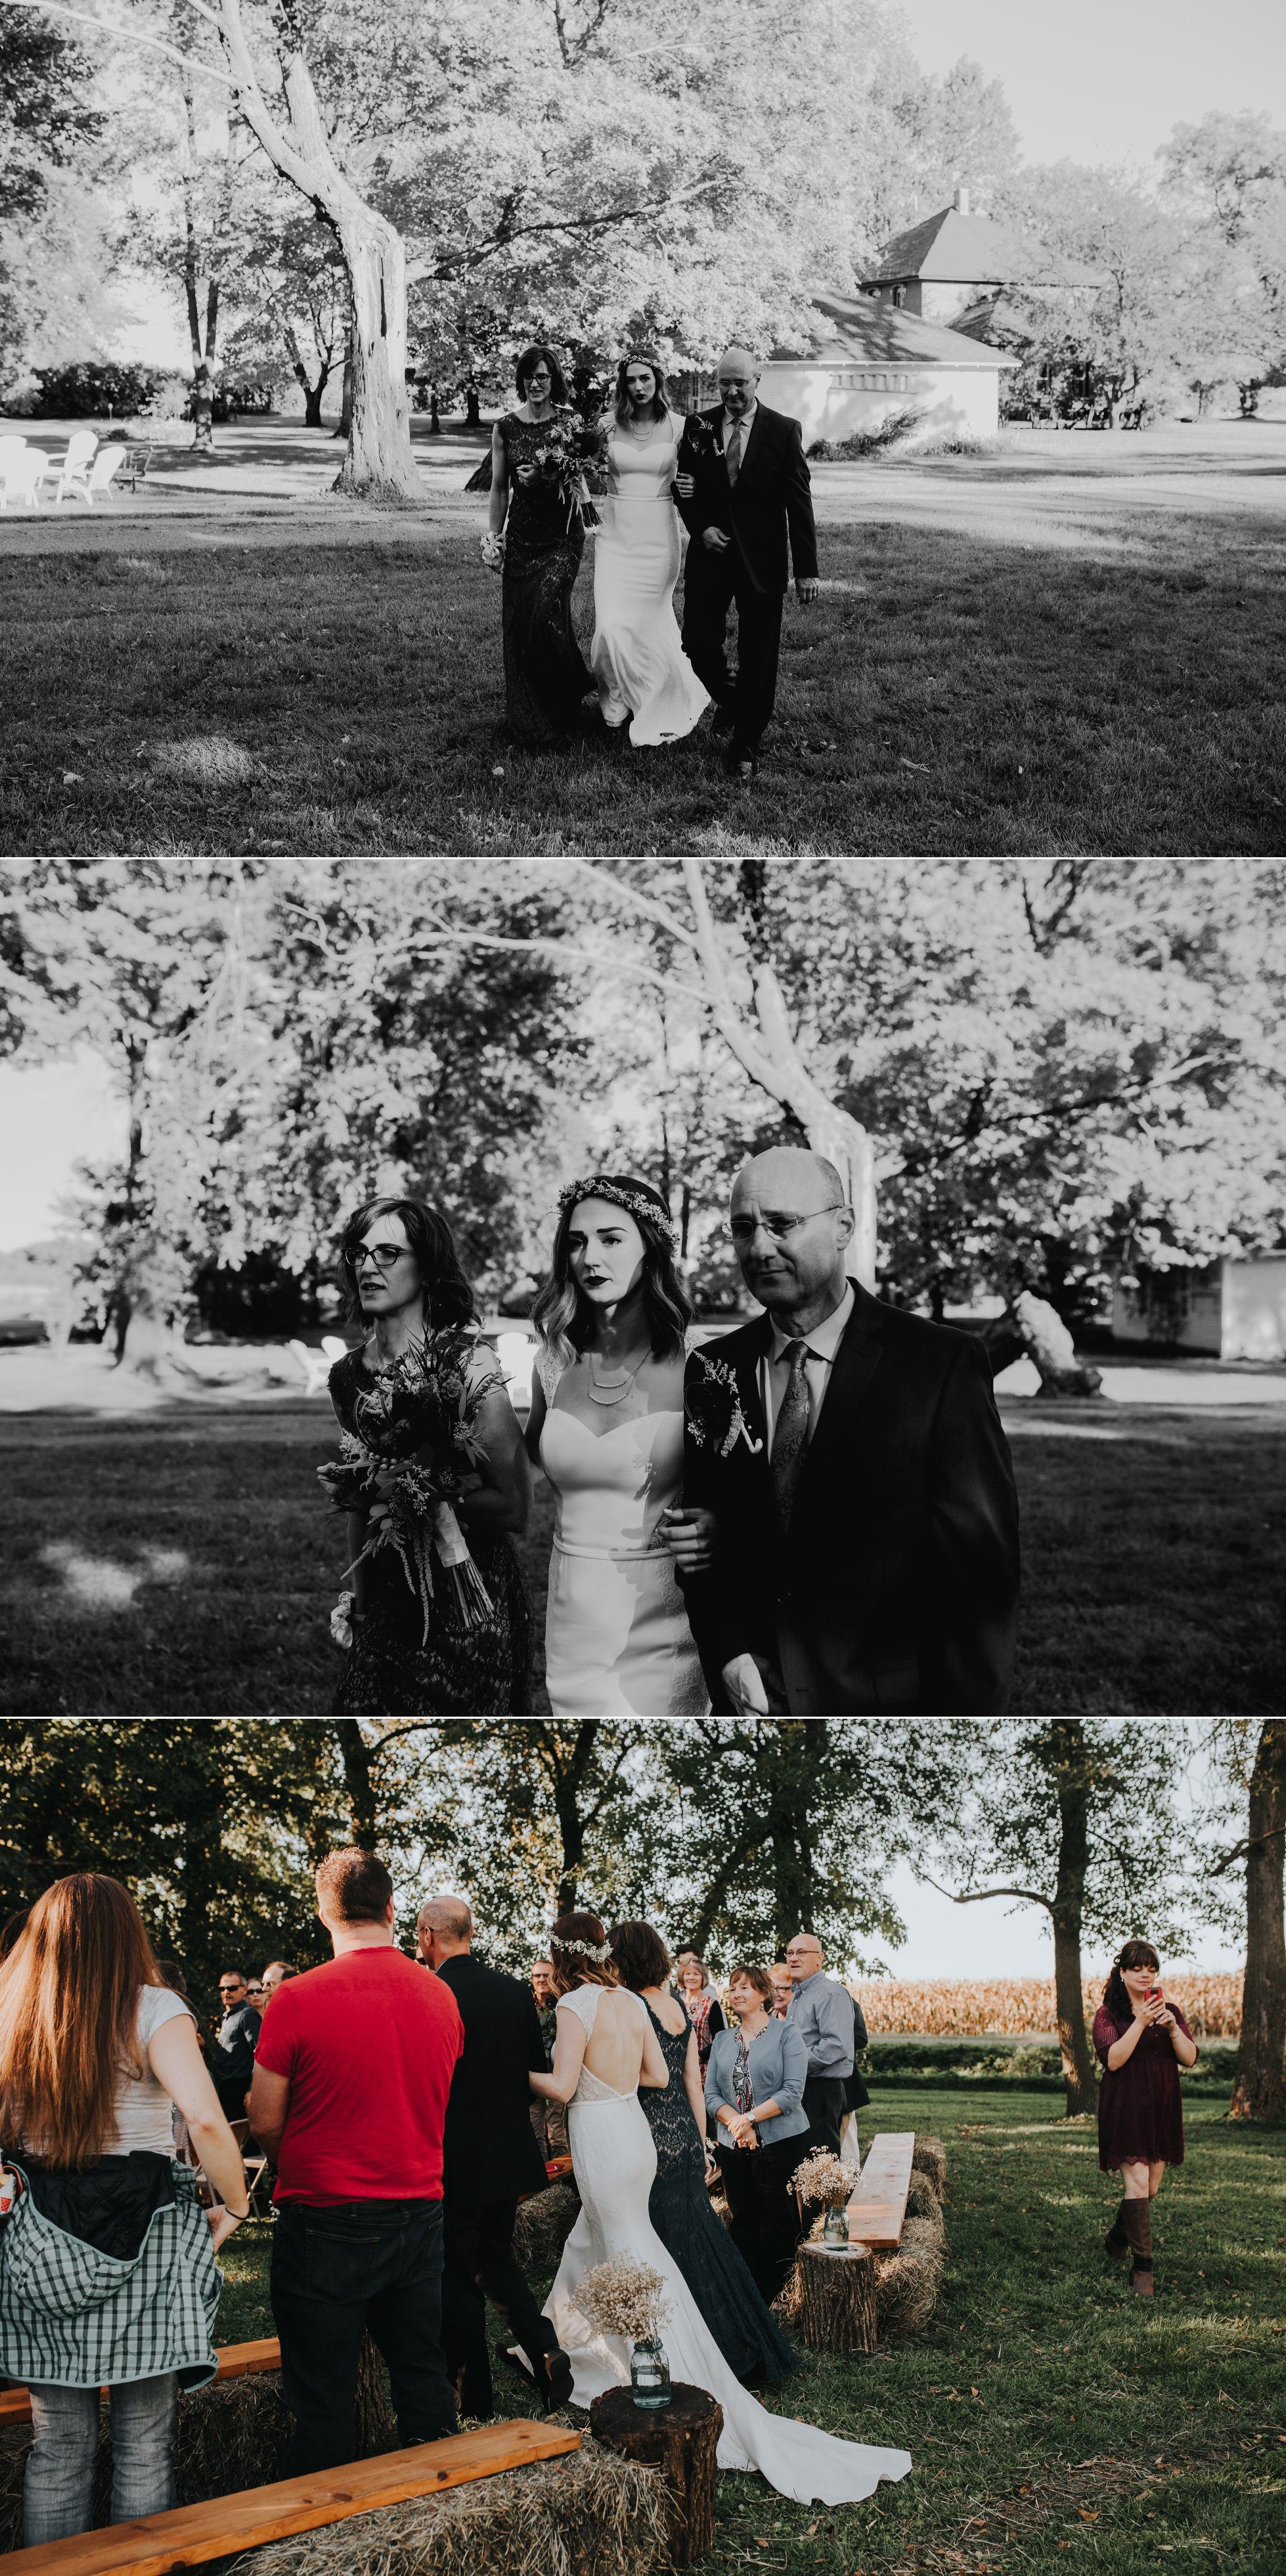 caroline and taylor minneapolis minnesota texas austin dallas houston wedding elopement destination intimate adventurous couple best photographer_0231.jpg